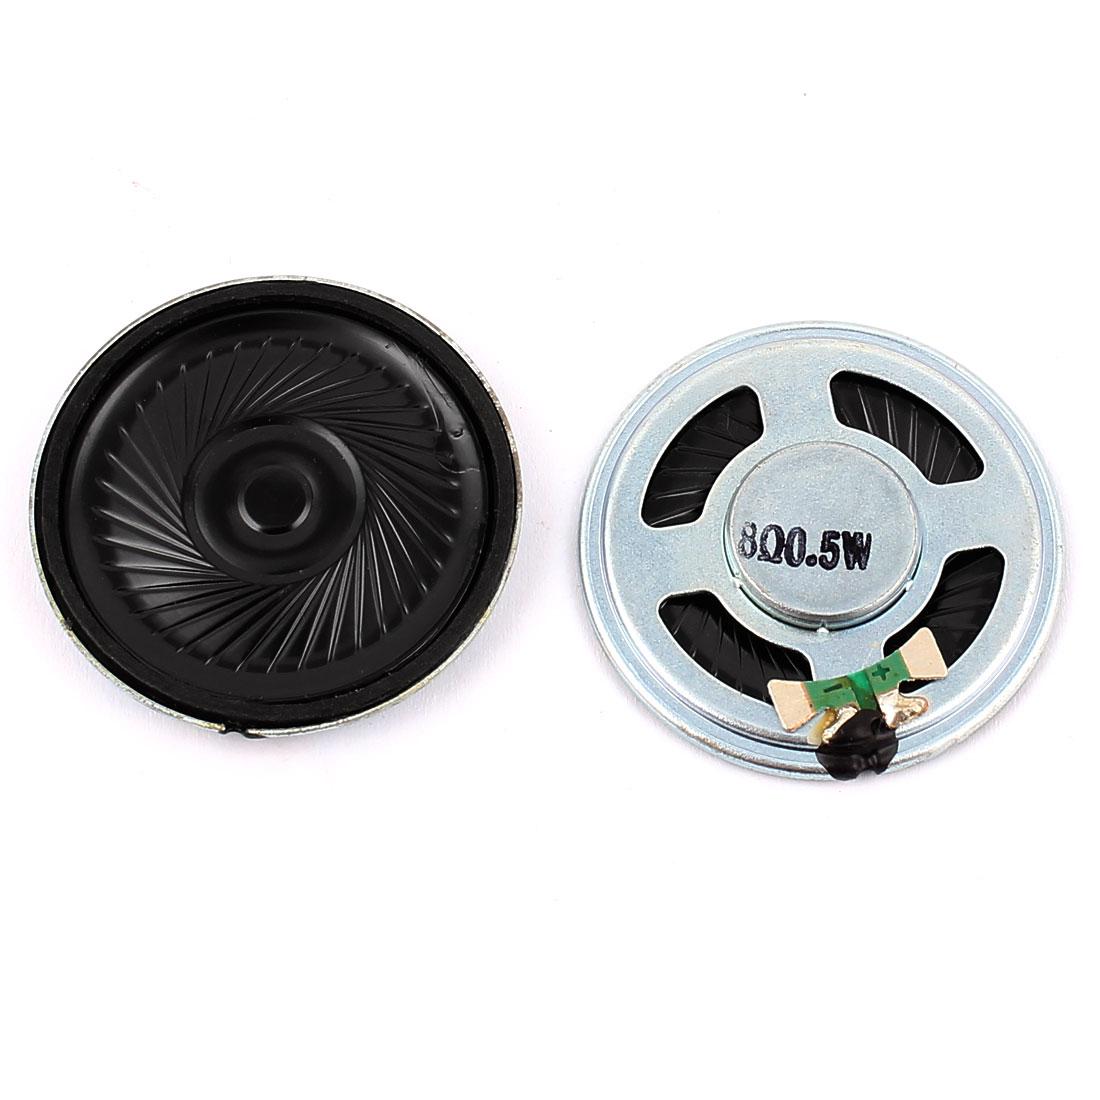 2 Pcs 40mm 8 Ohm 0.5W Metal External Magnetic Speaker Loudspeaker Silver Tone